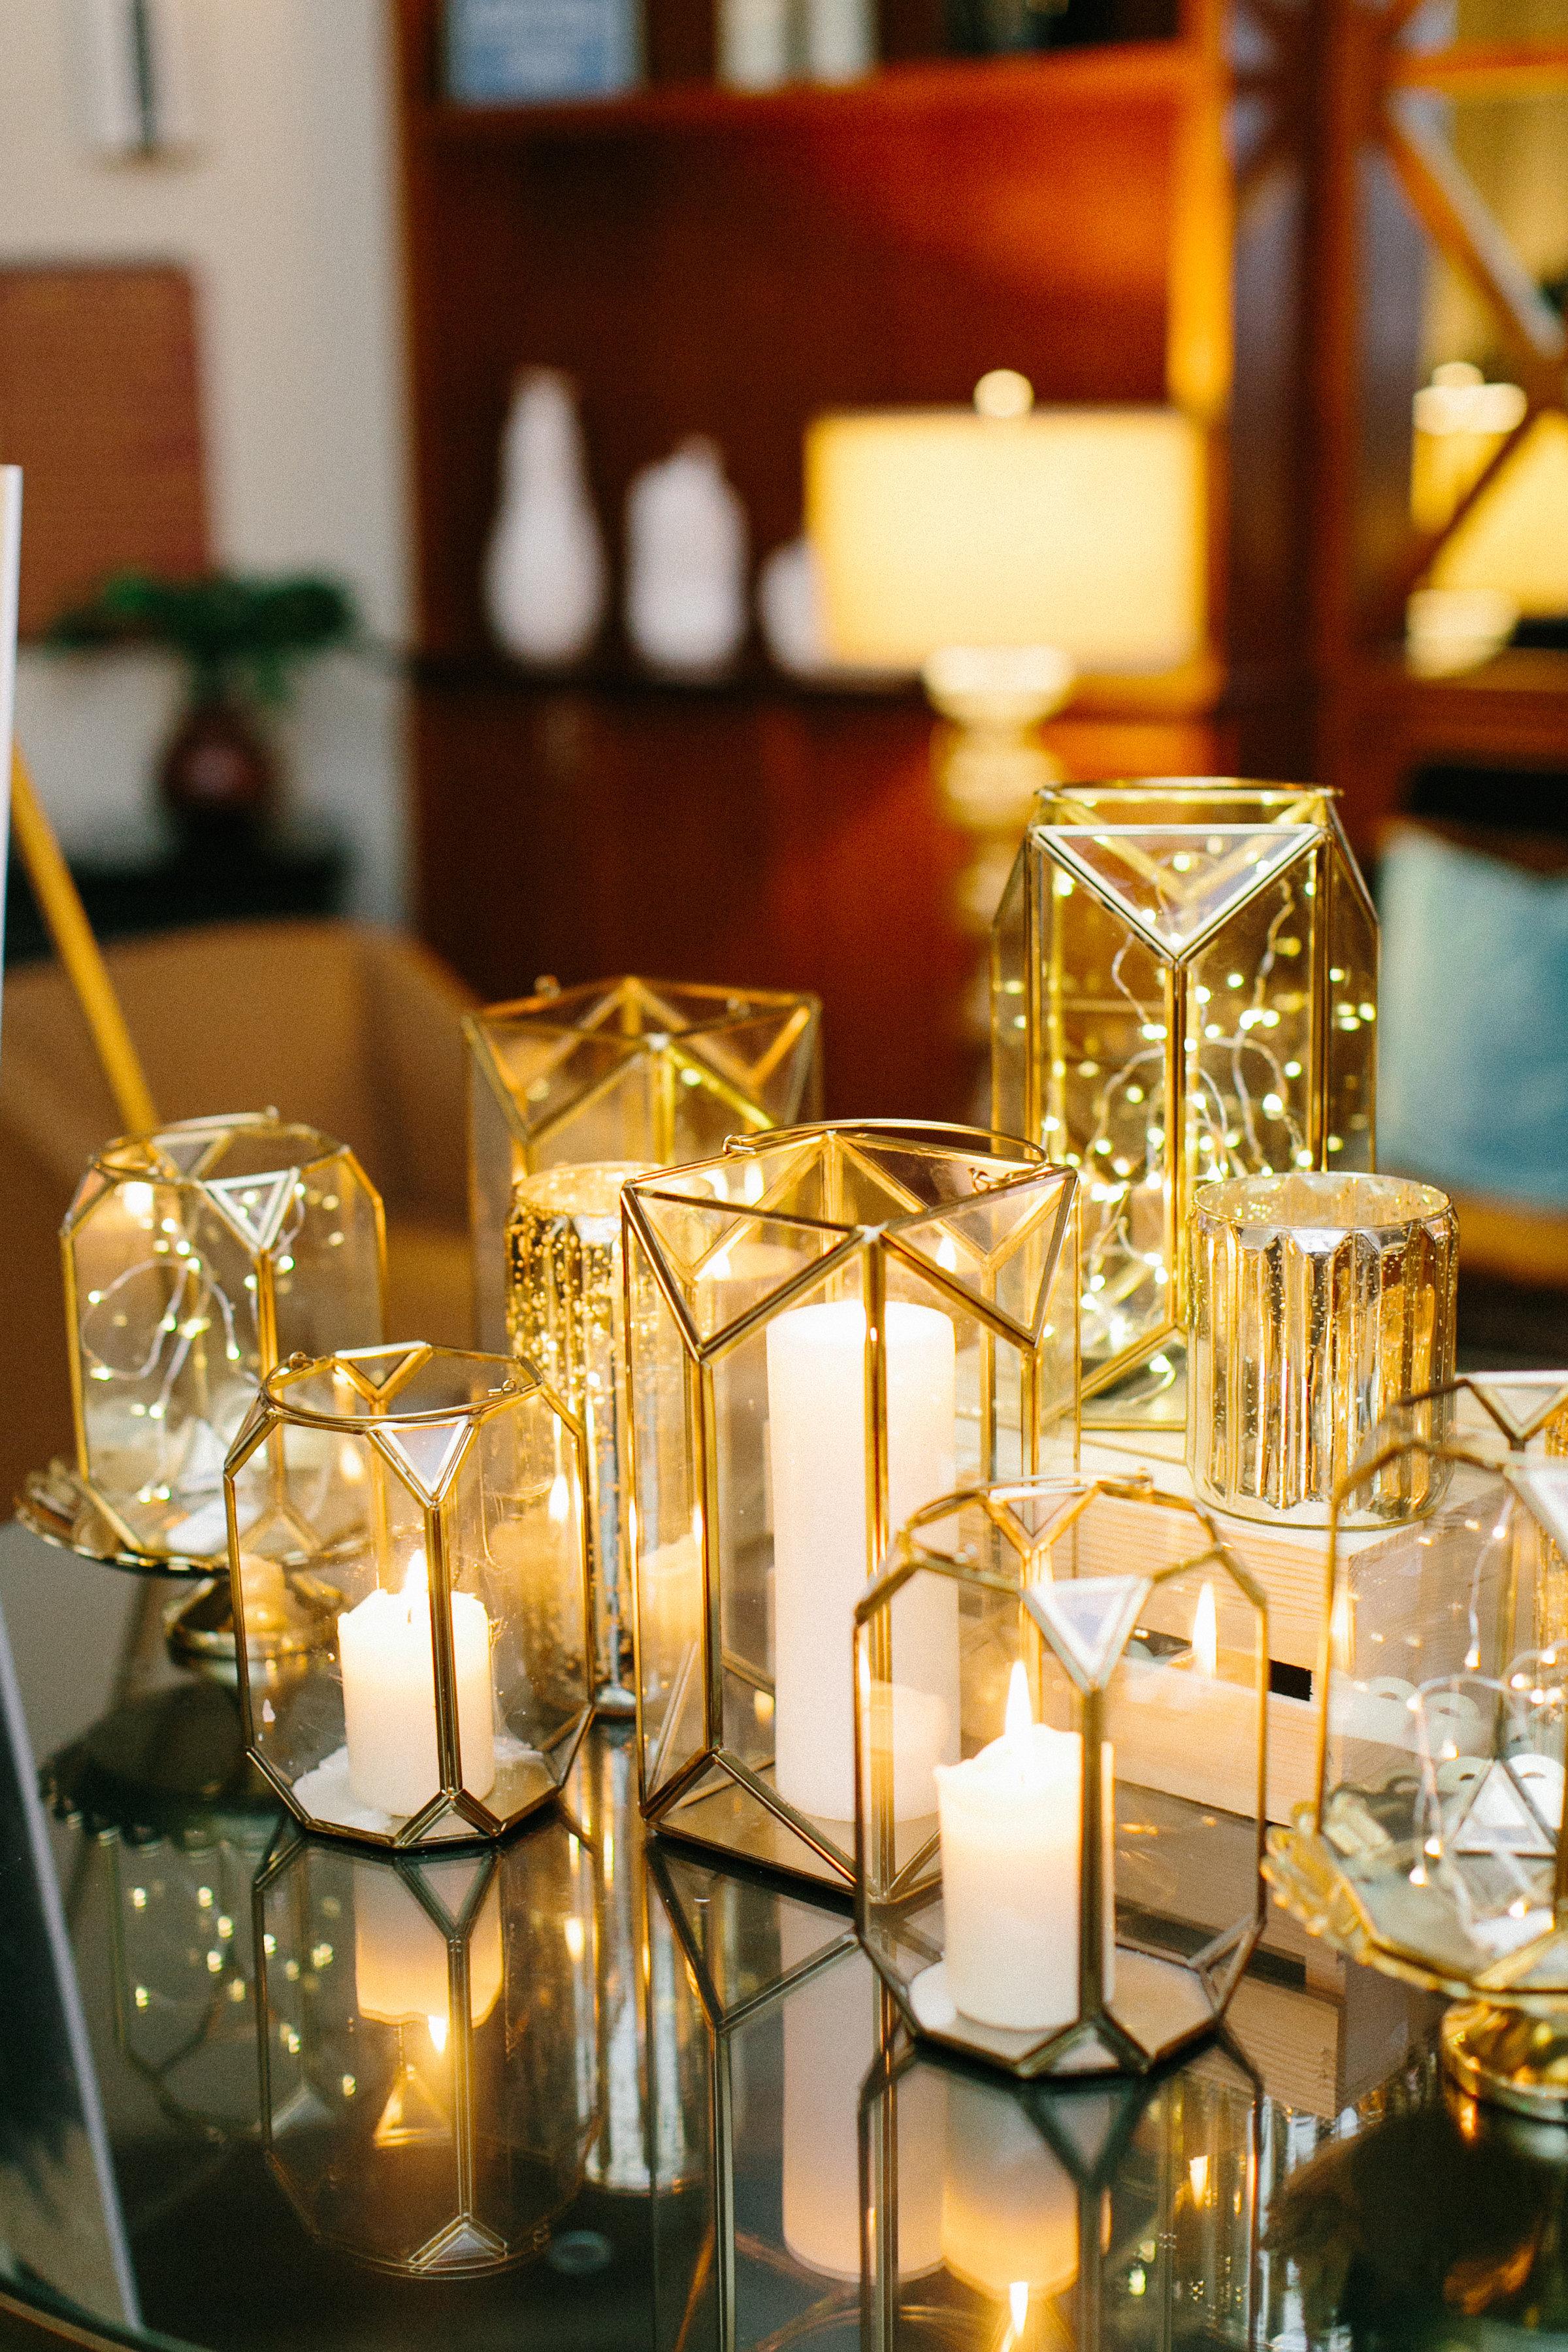 2017_Carly_Milbrath_Jefferson_Street_Inn_Wedding_Wausau_WI_398.JPG